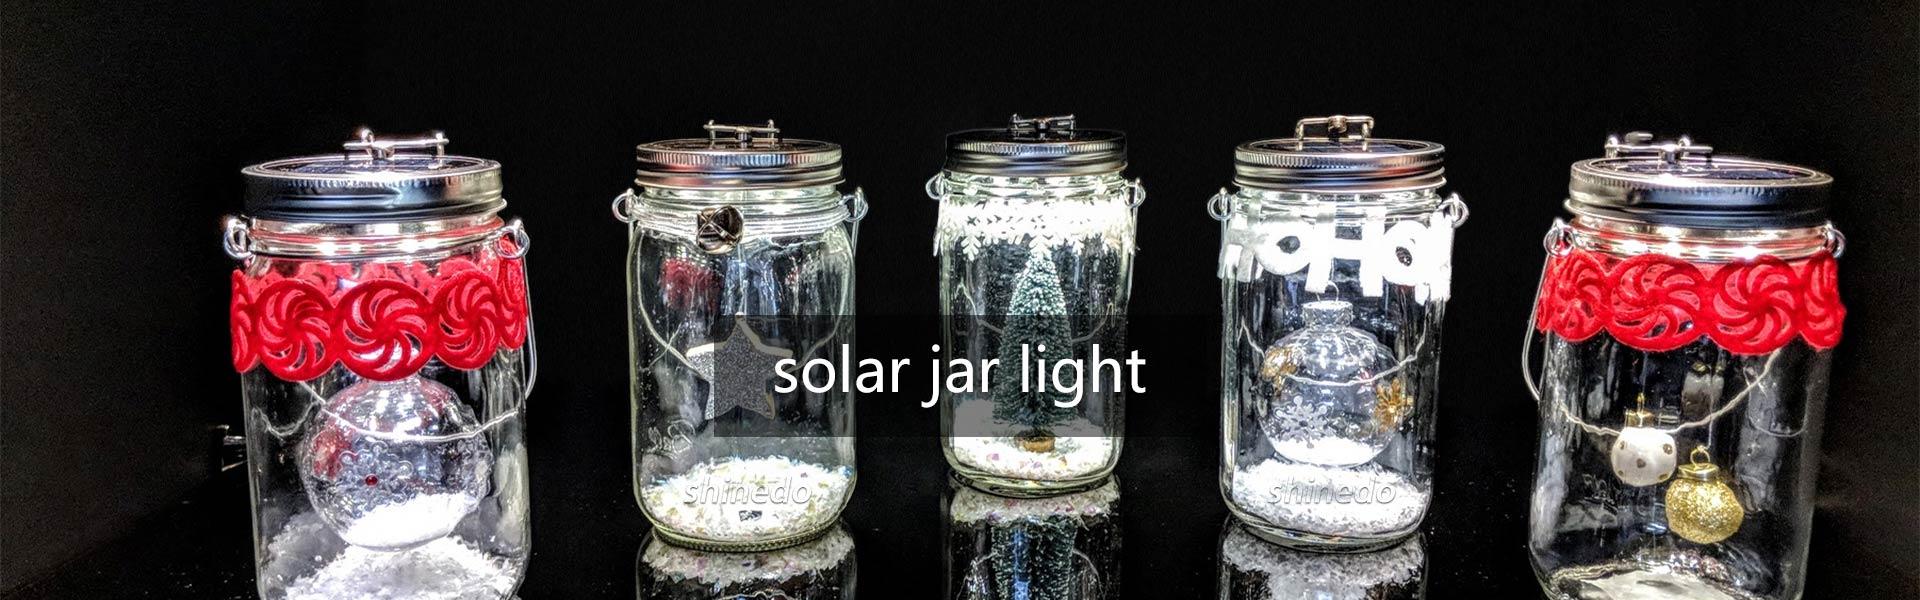 Solar Jar Light Factory China